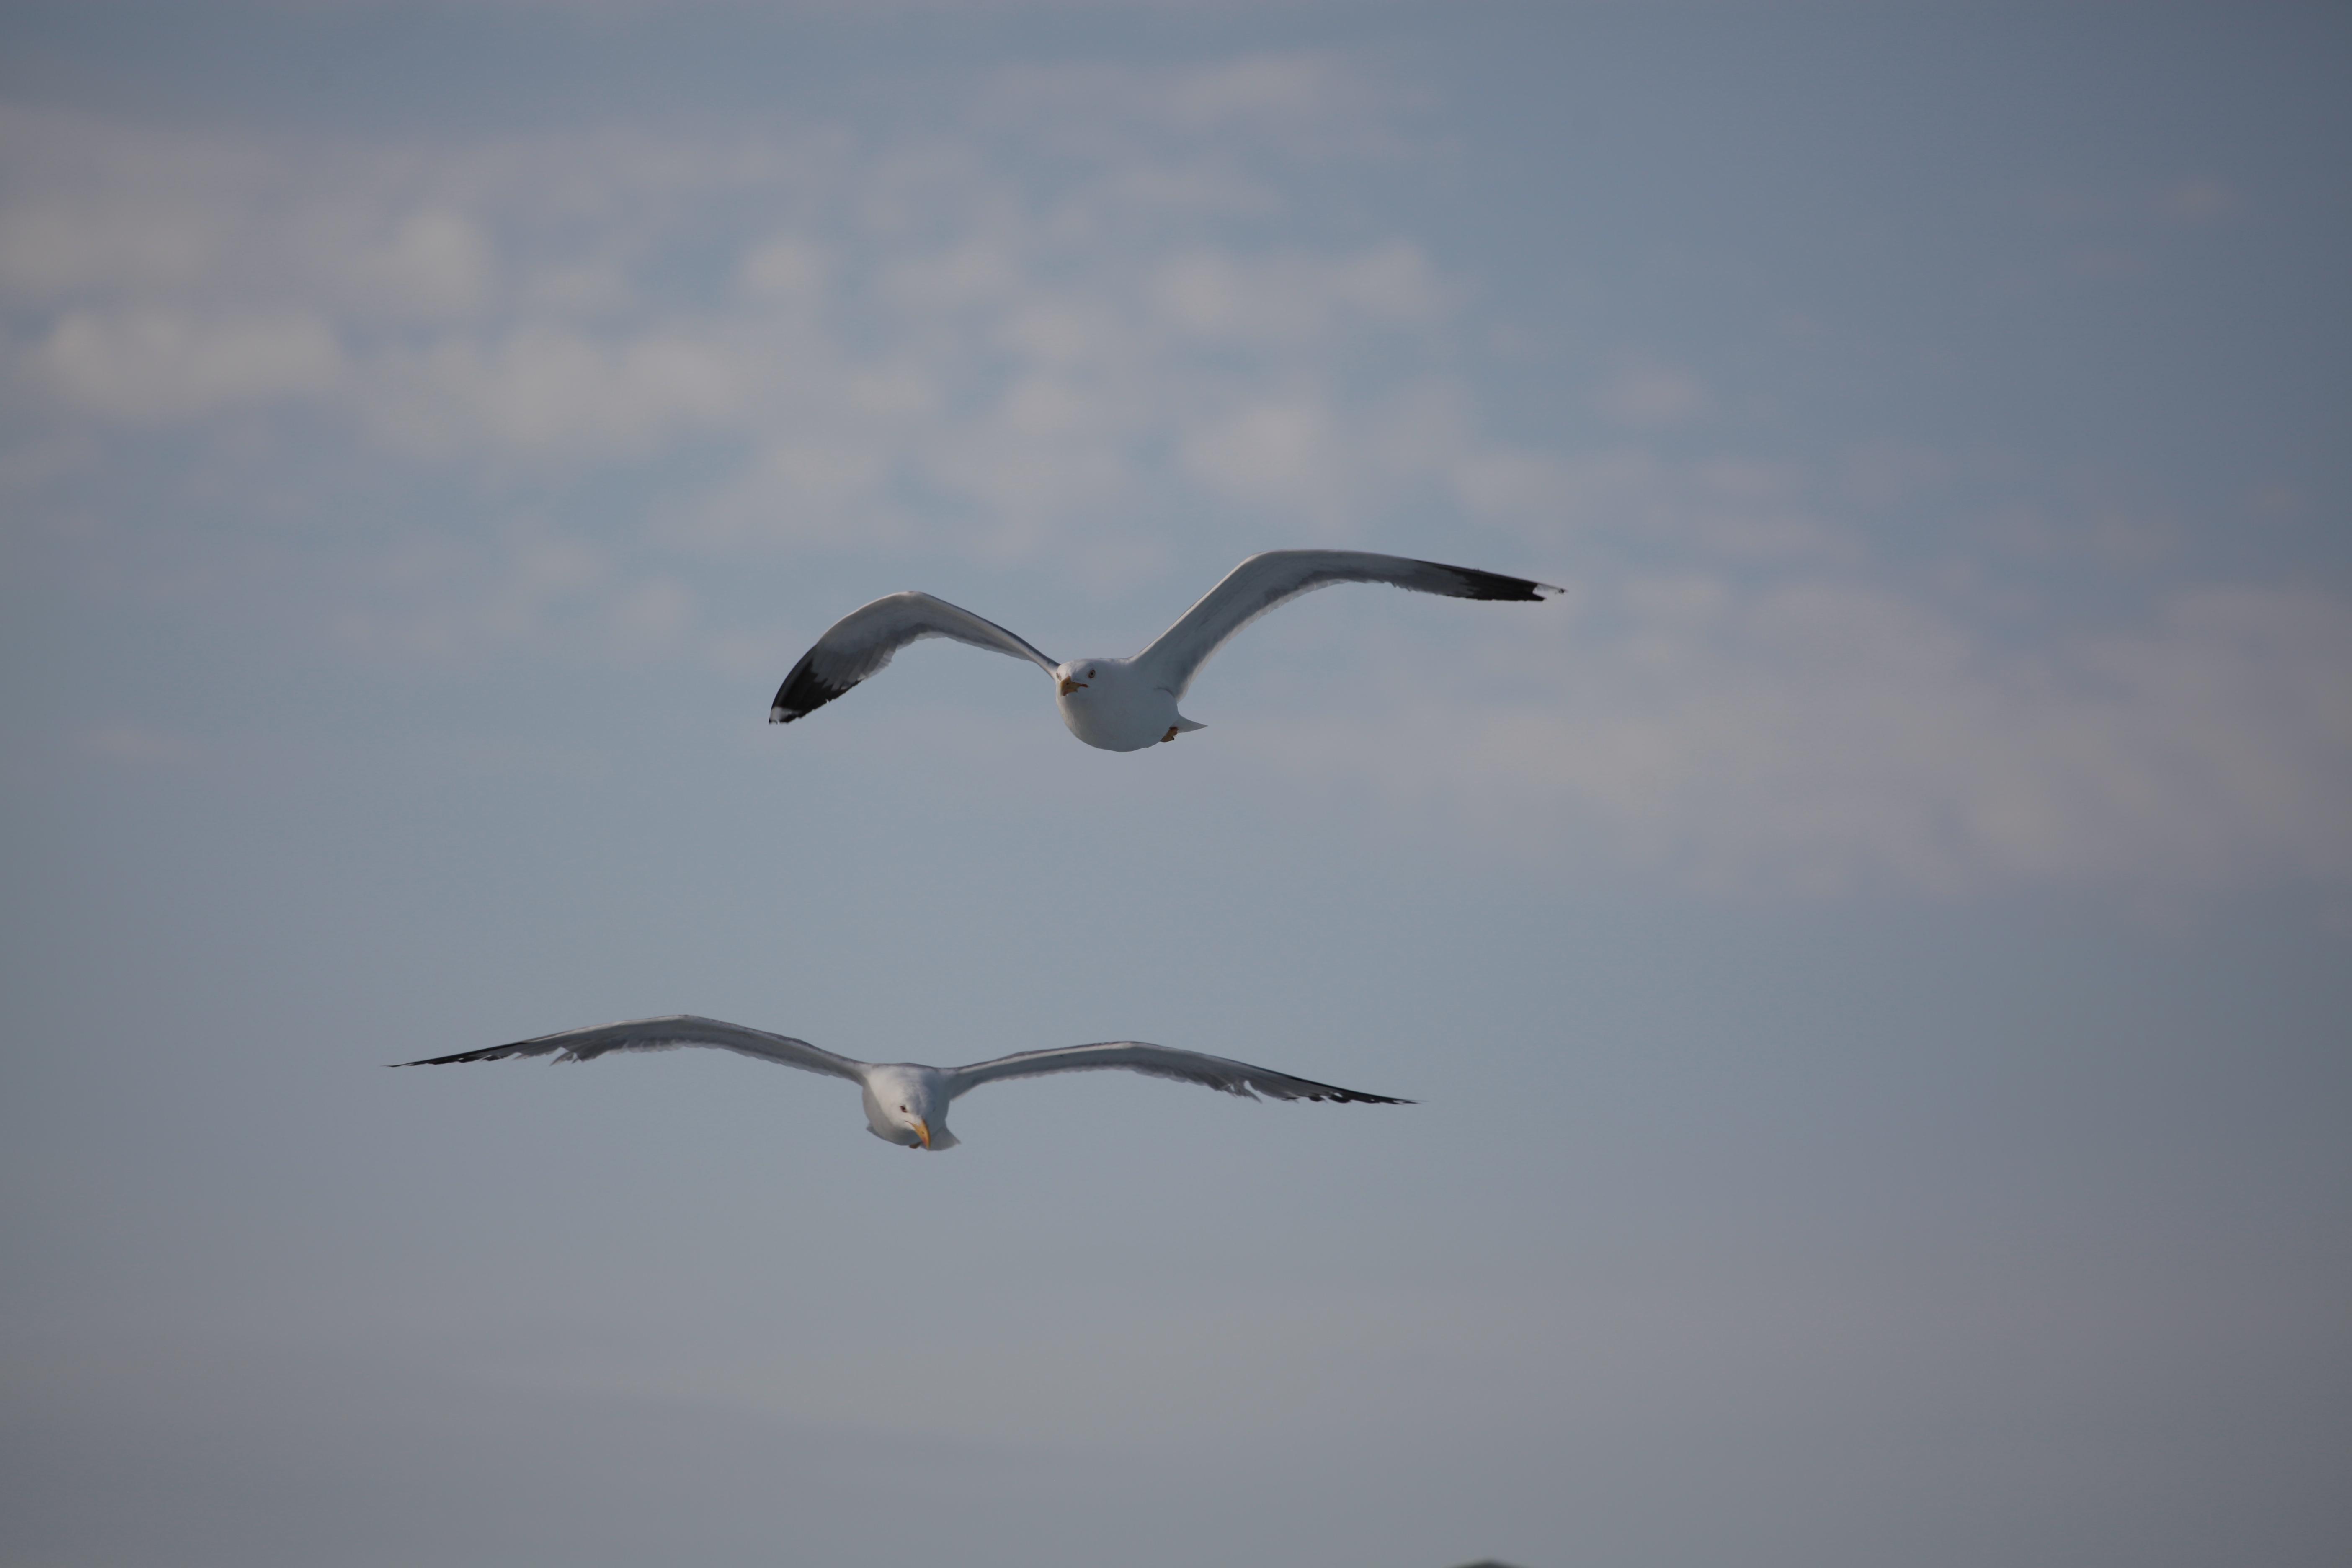 mcs_kor_2_seagulls_2014_06_23_999_65